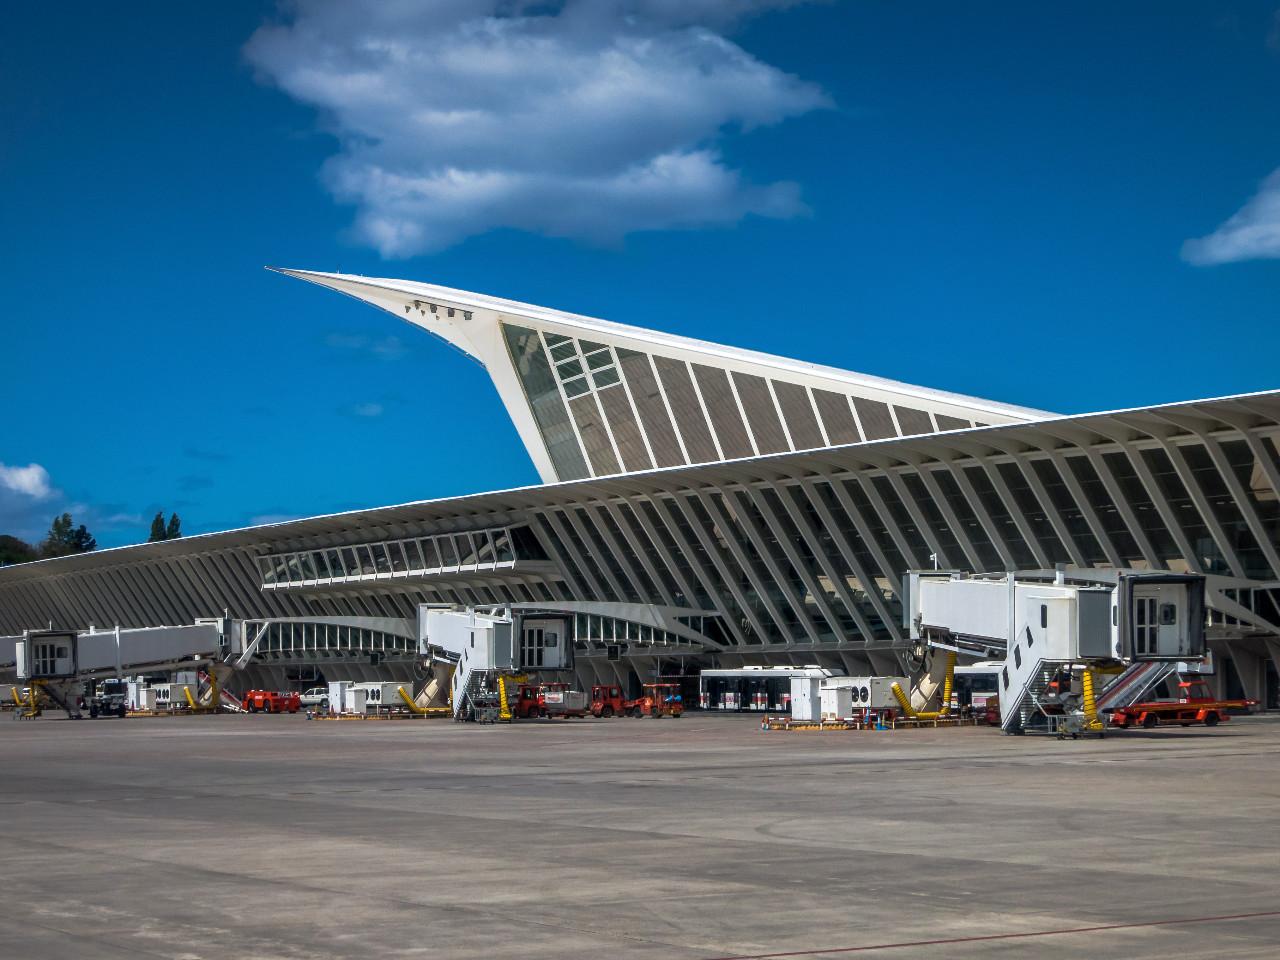 La Paloma Flughafen Bilbao